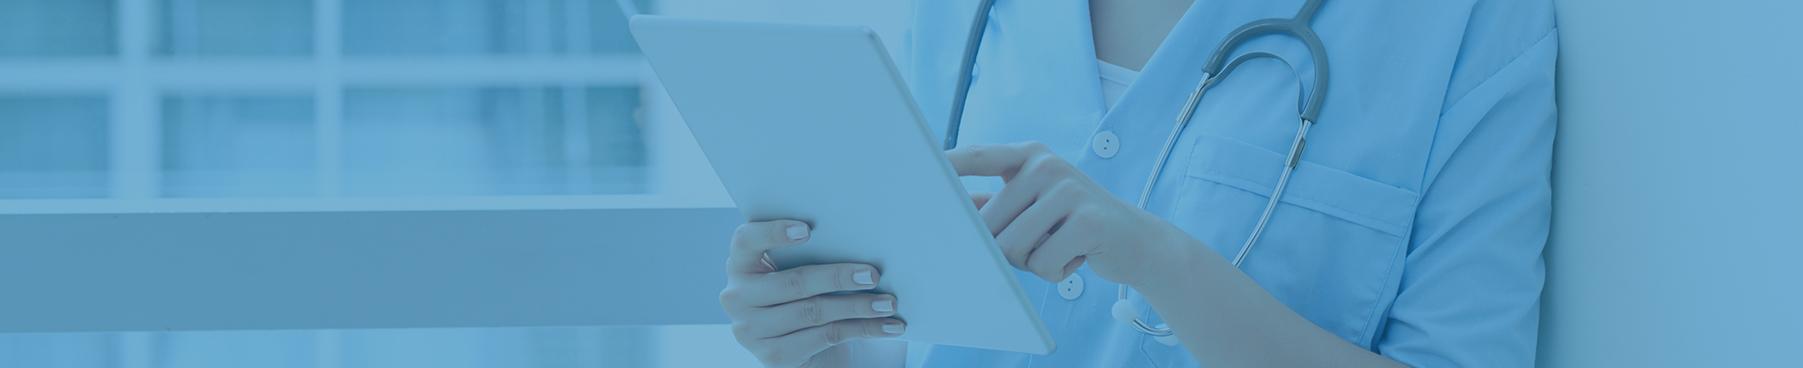 Ispn International Standards For Professional Nurses Program